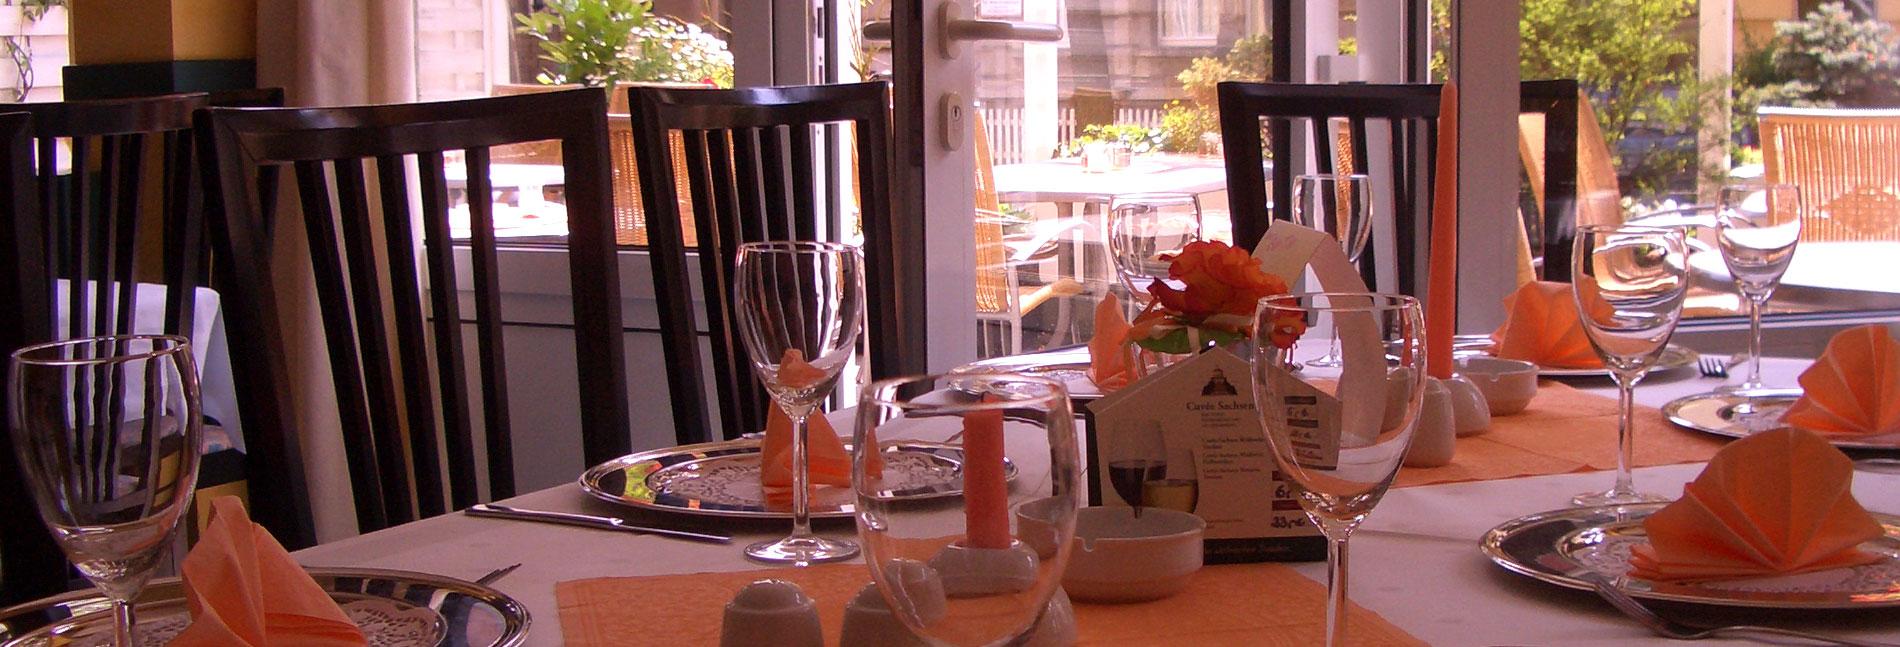 wettiner-hof-riesa-restaurant